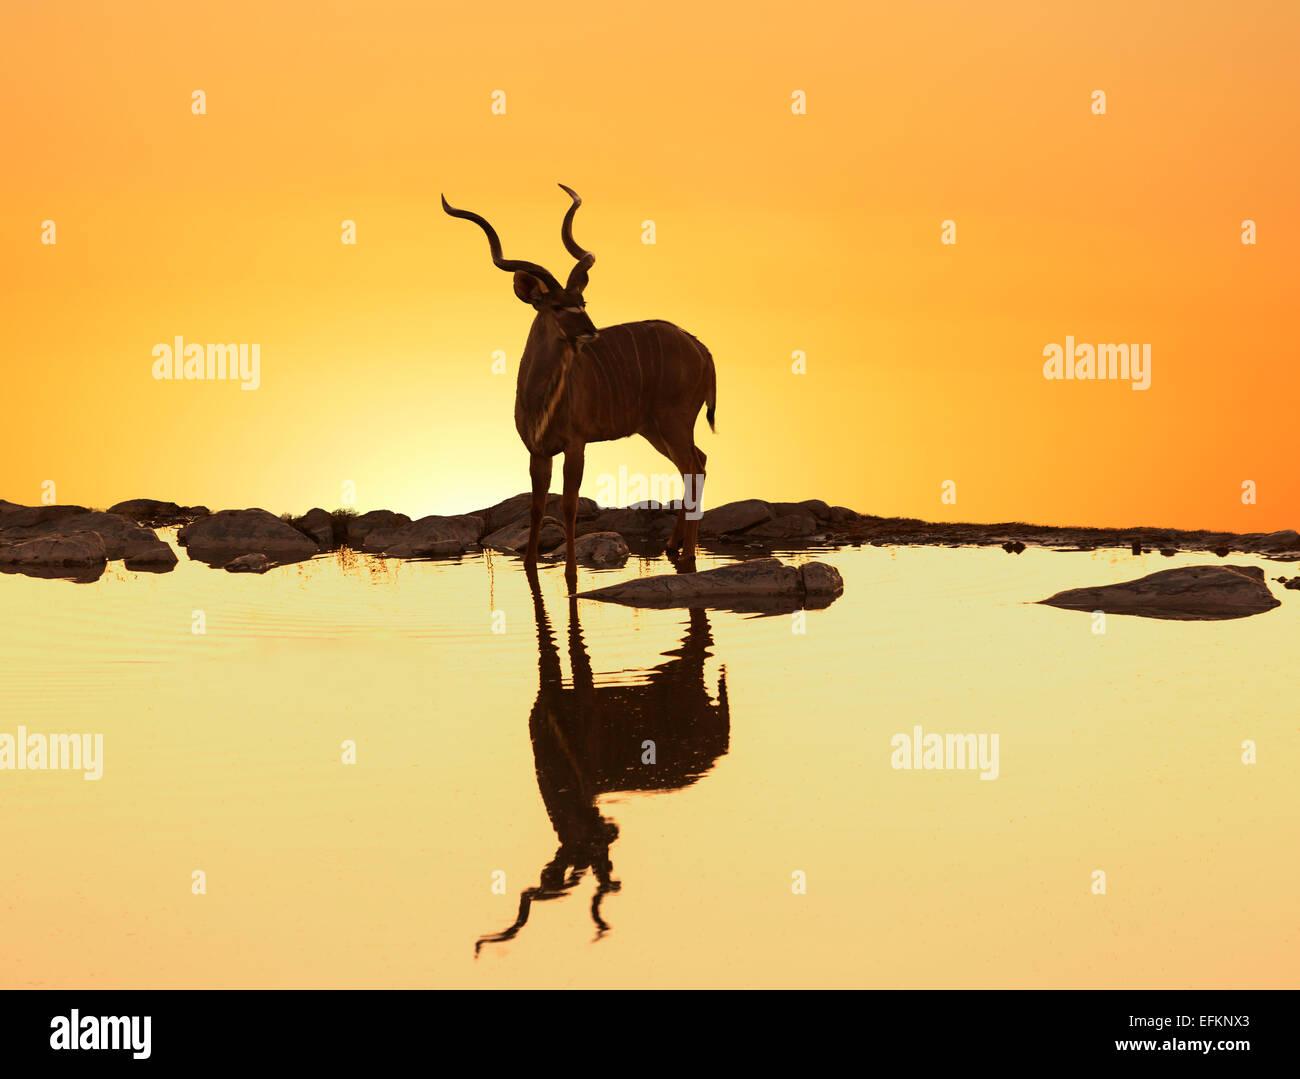 Kudu (Tragelaphus Strepsiceros) reflektiert in einem See bei Sonnenuntergang, Etosha Nationalpark, Namibia Stockbild